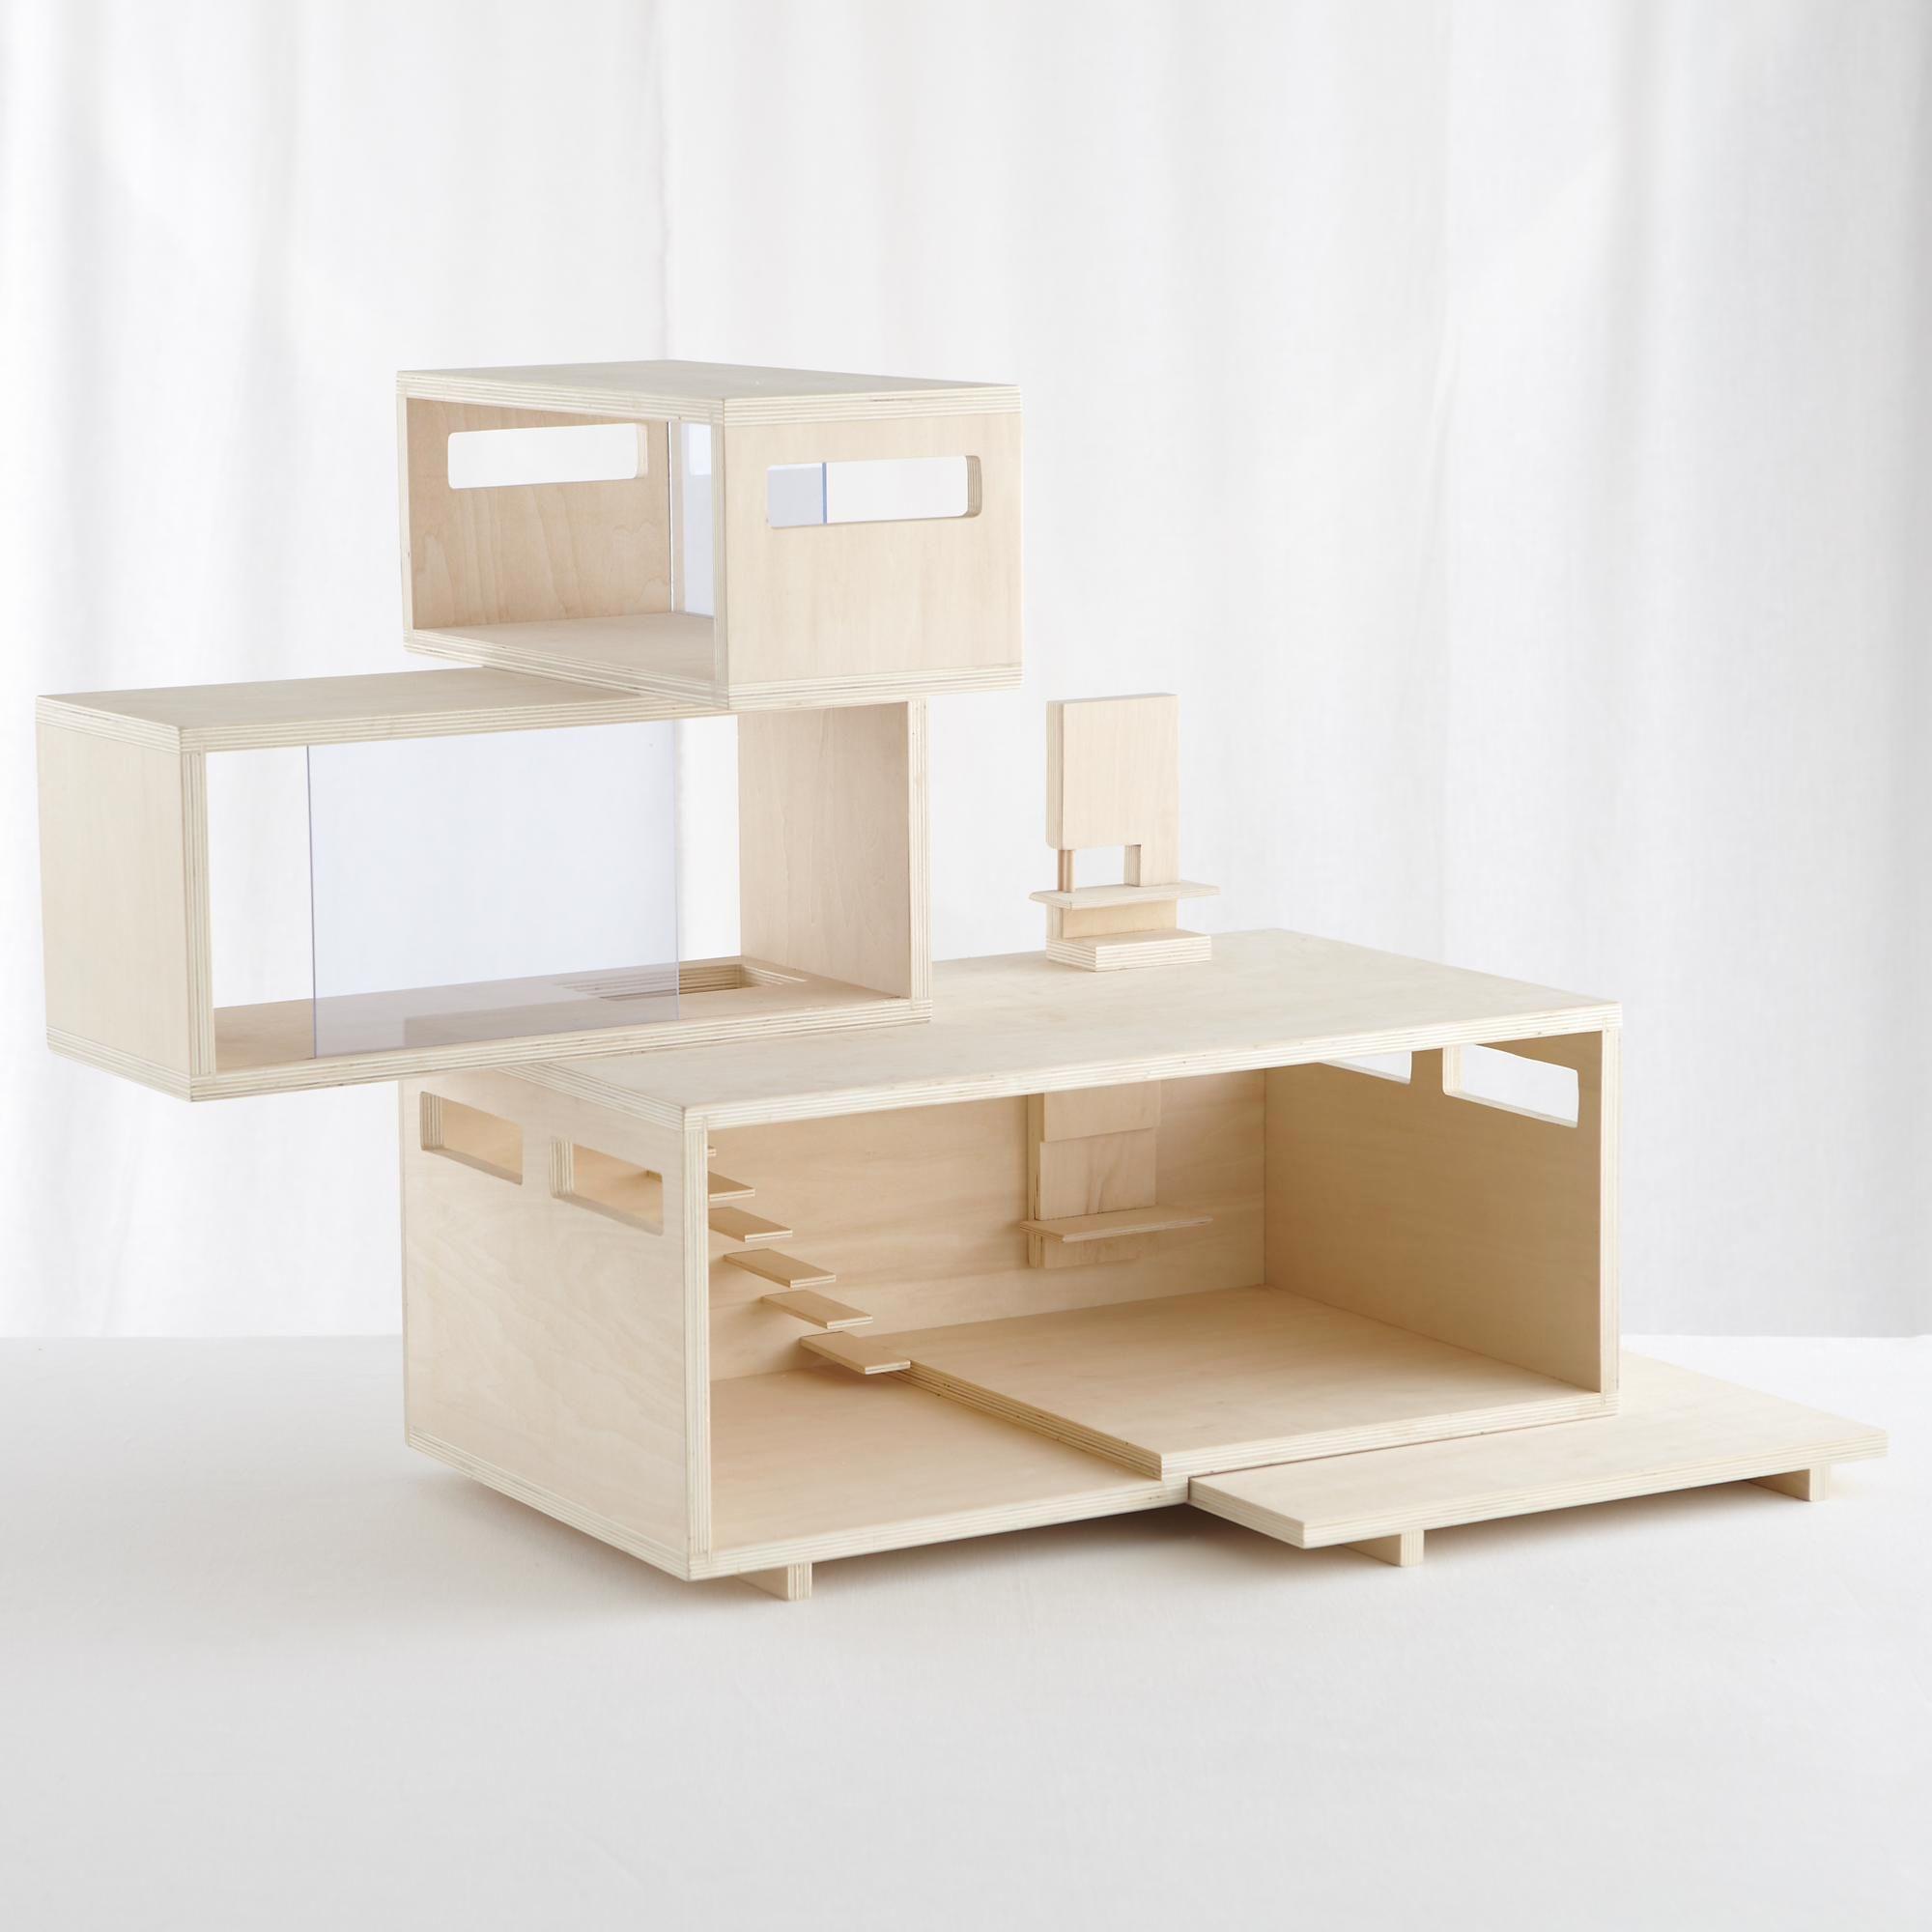 A New Project 1 6 Scale Modern Dollhouse Jen